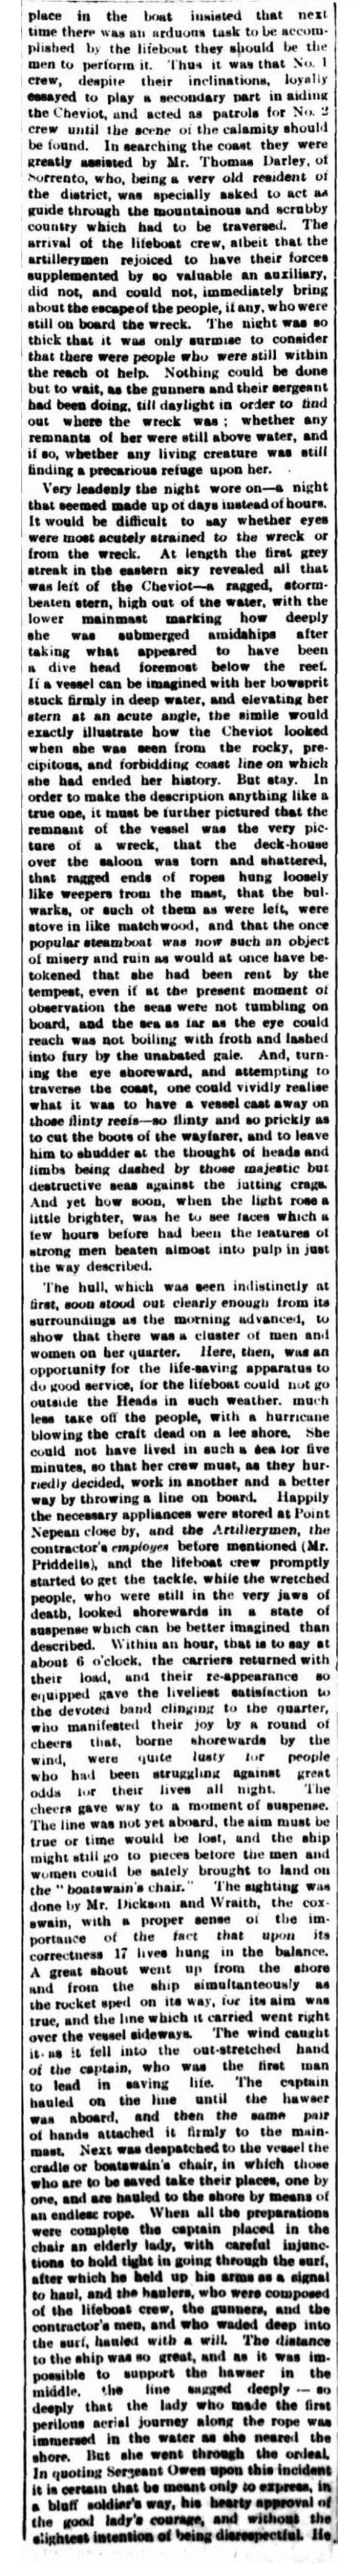 news - Cheviot 1848 col 3